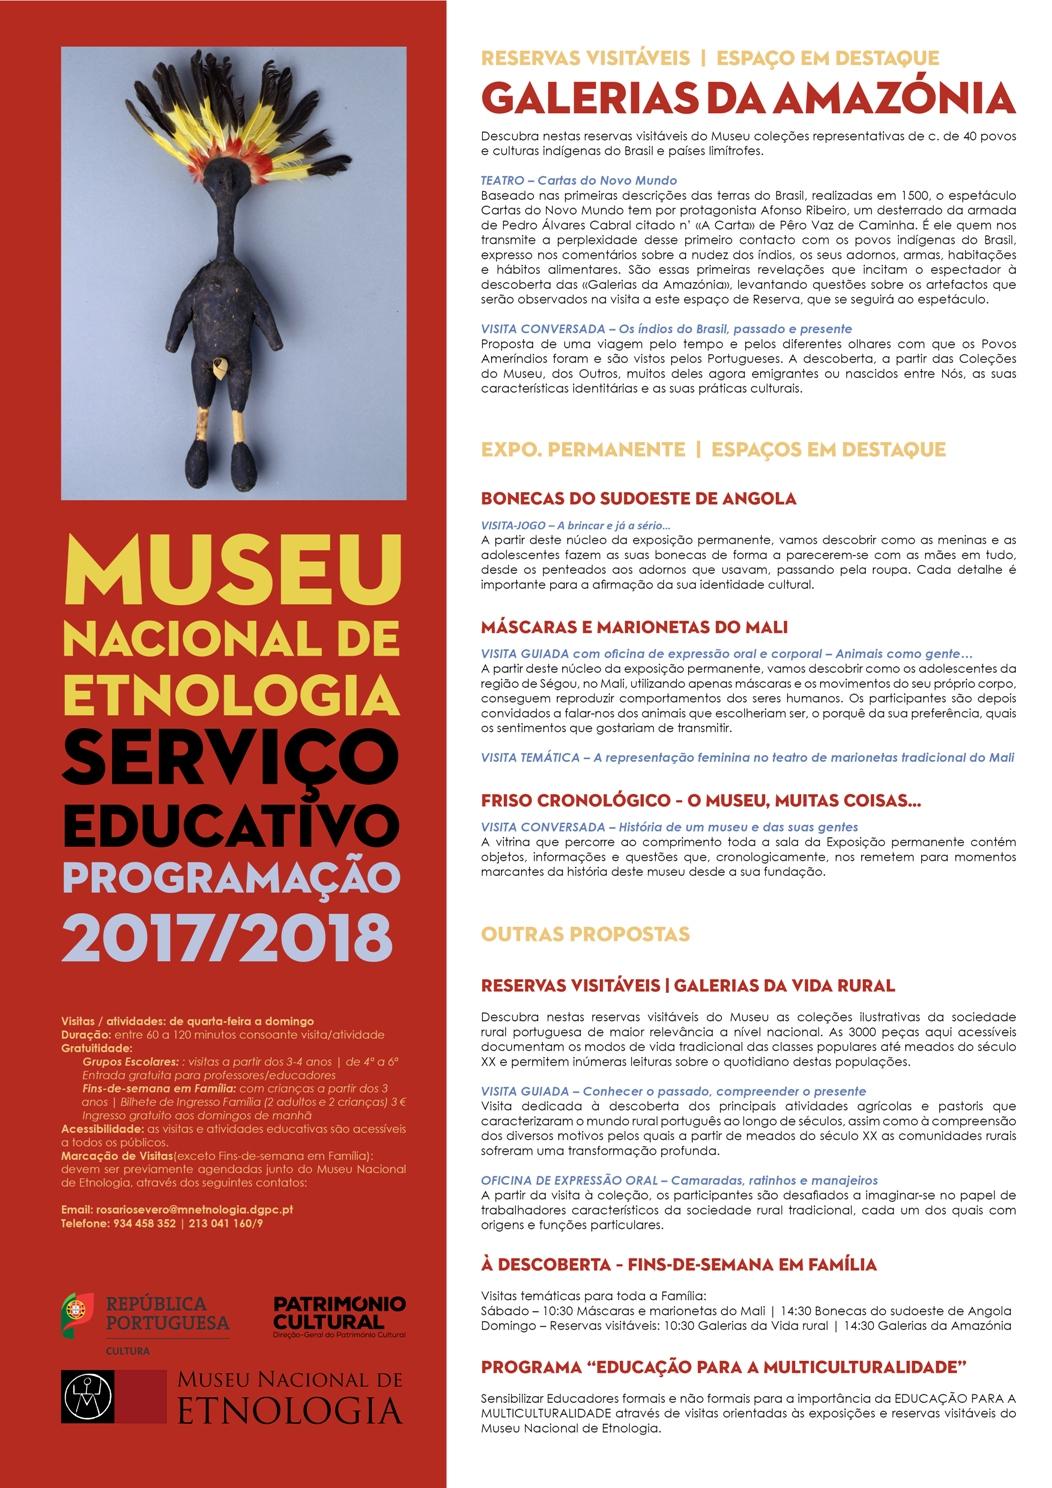 Programa Educativo 2017-2018 | Museu Nacional de Etnologia